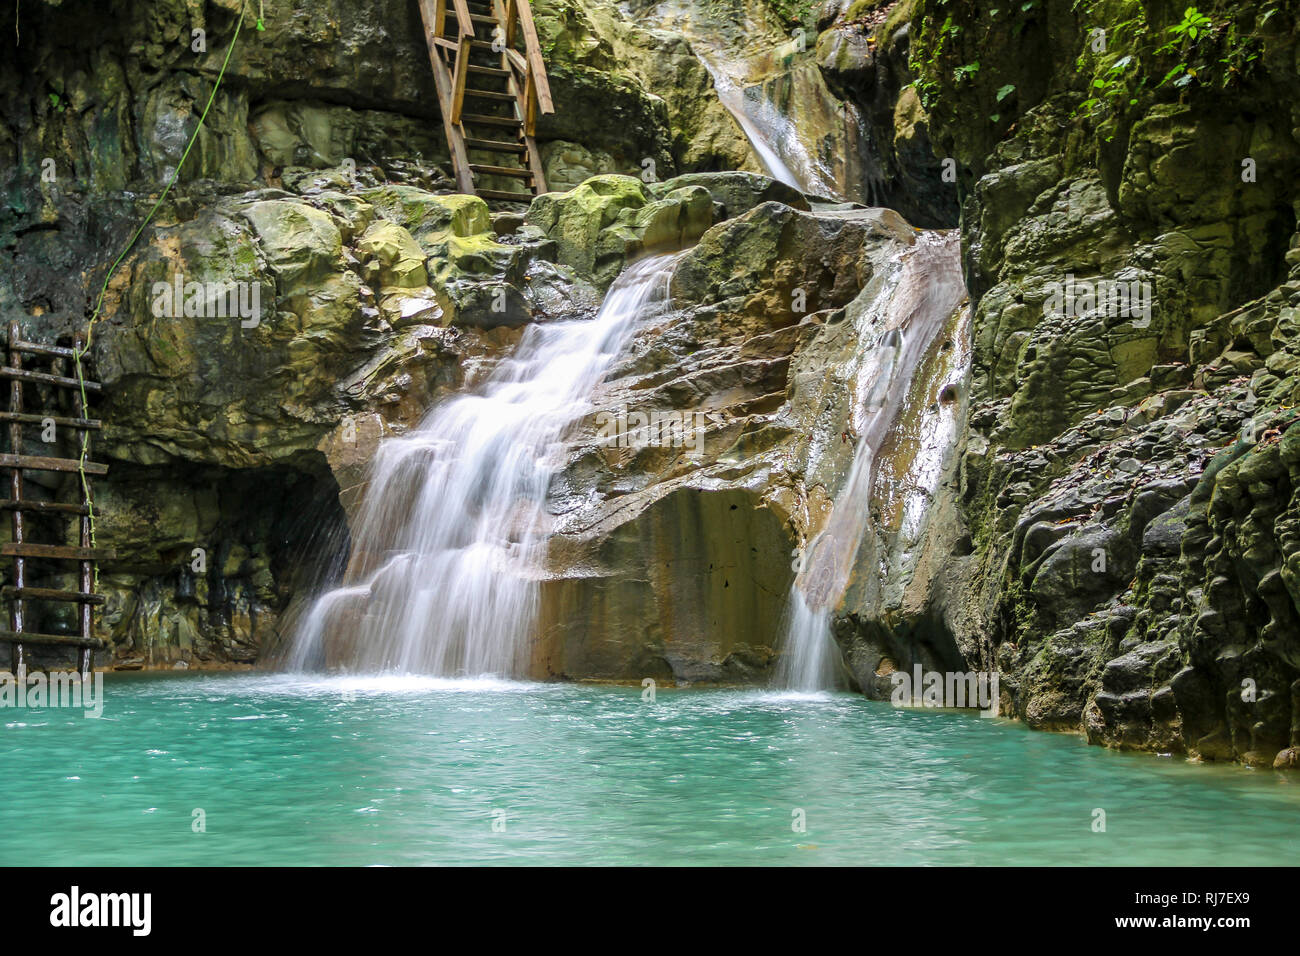 Große Antillen, Karibik, Dominikanische Republik, Imbert, Naturjuwel 27 Charcos de Damajagua Foto Stock